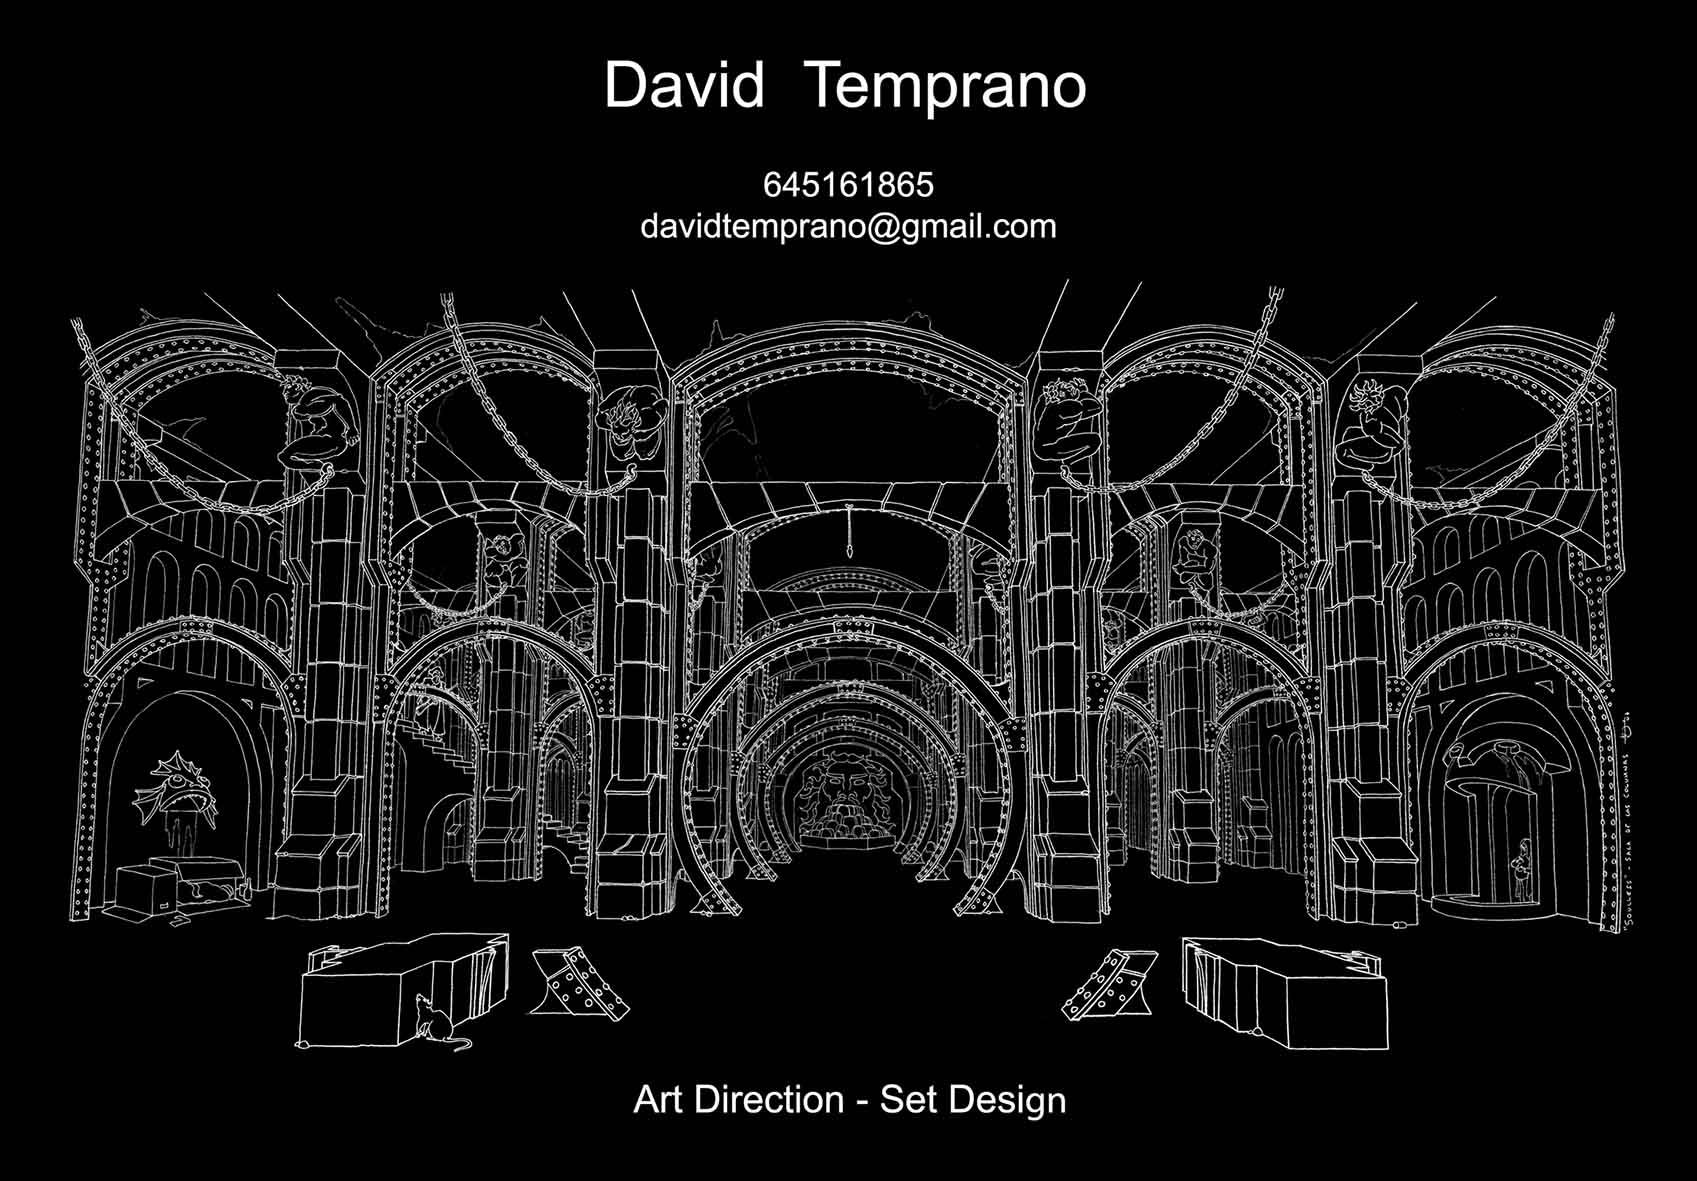 david-temprano-001-portada